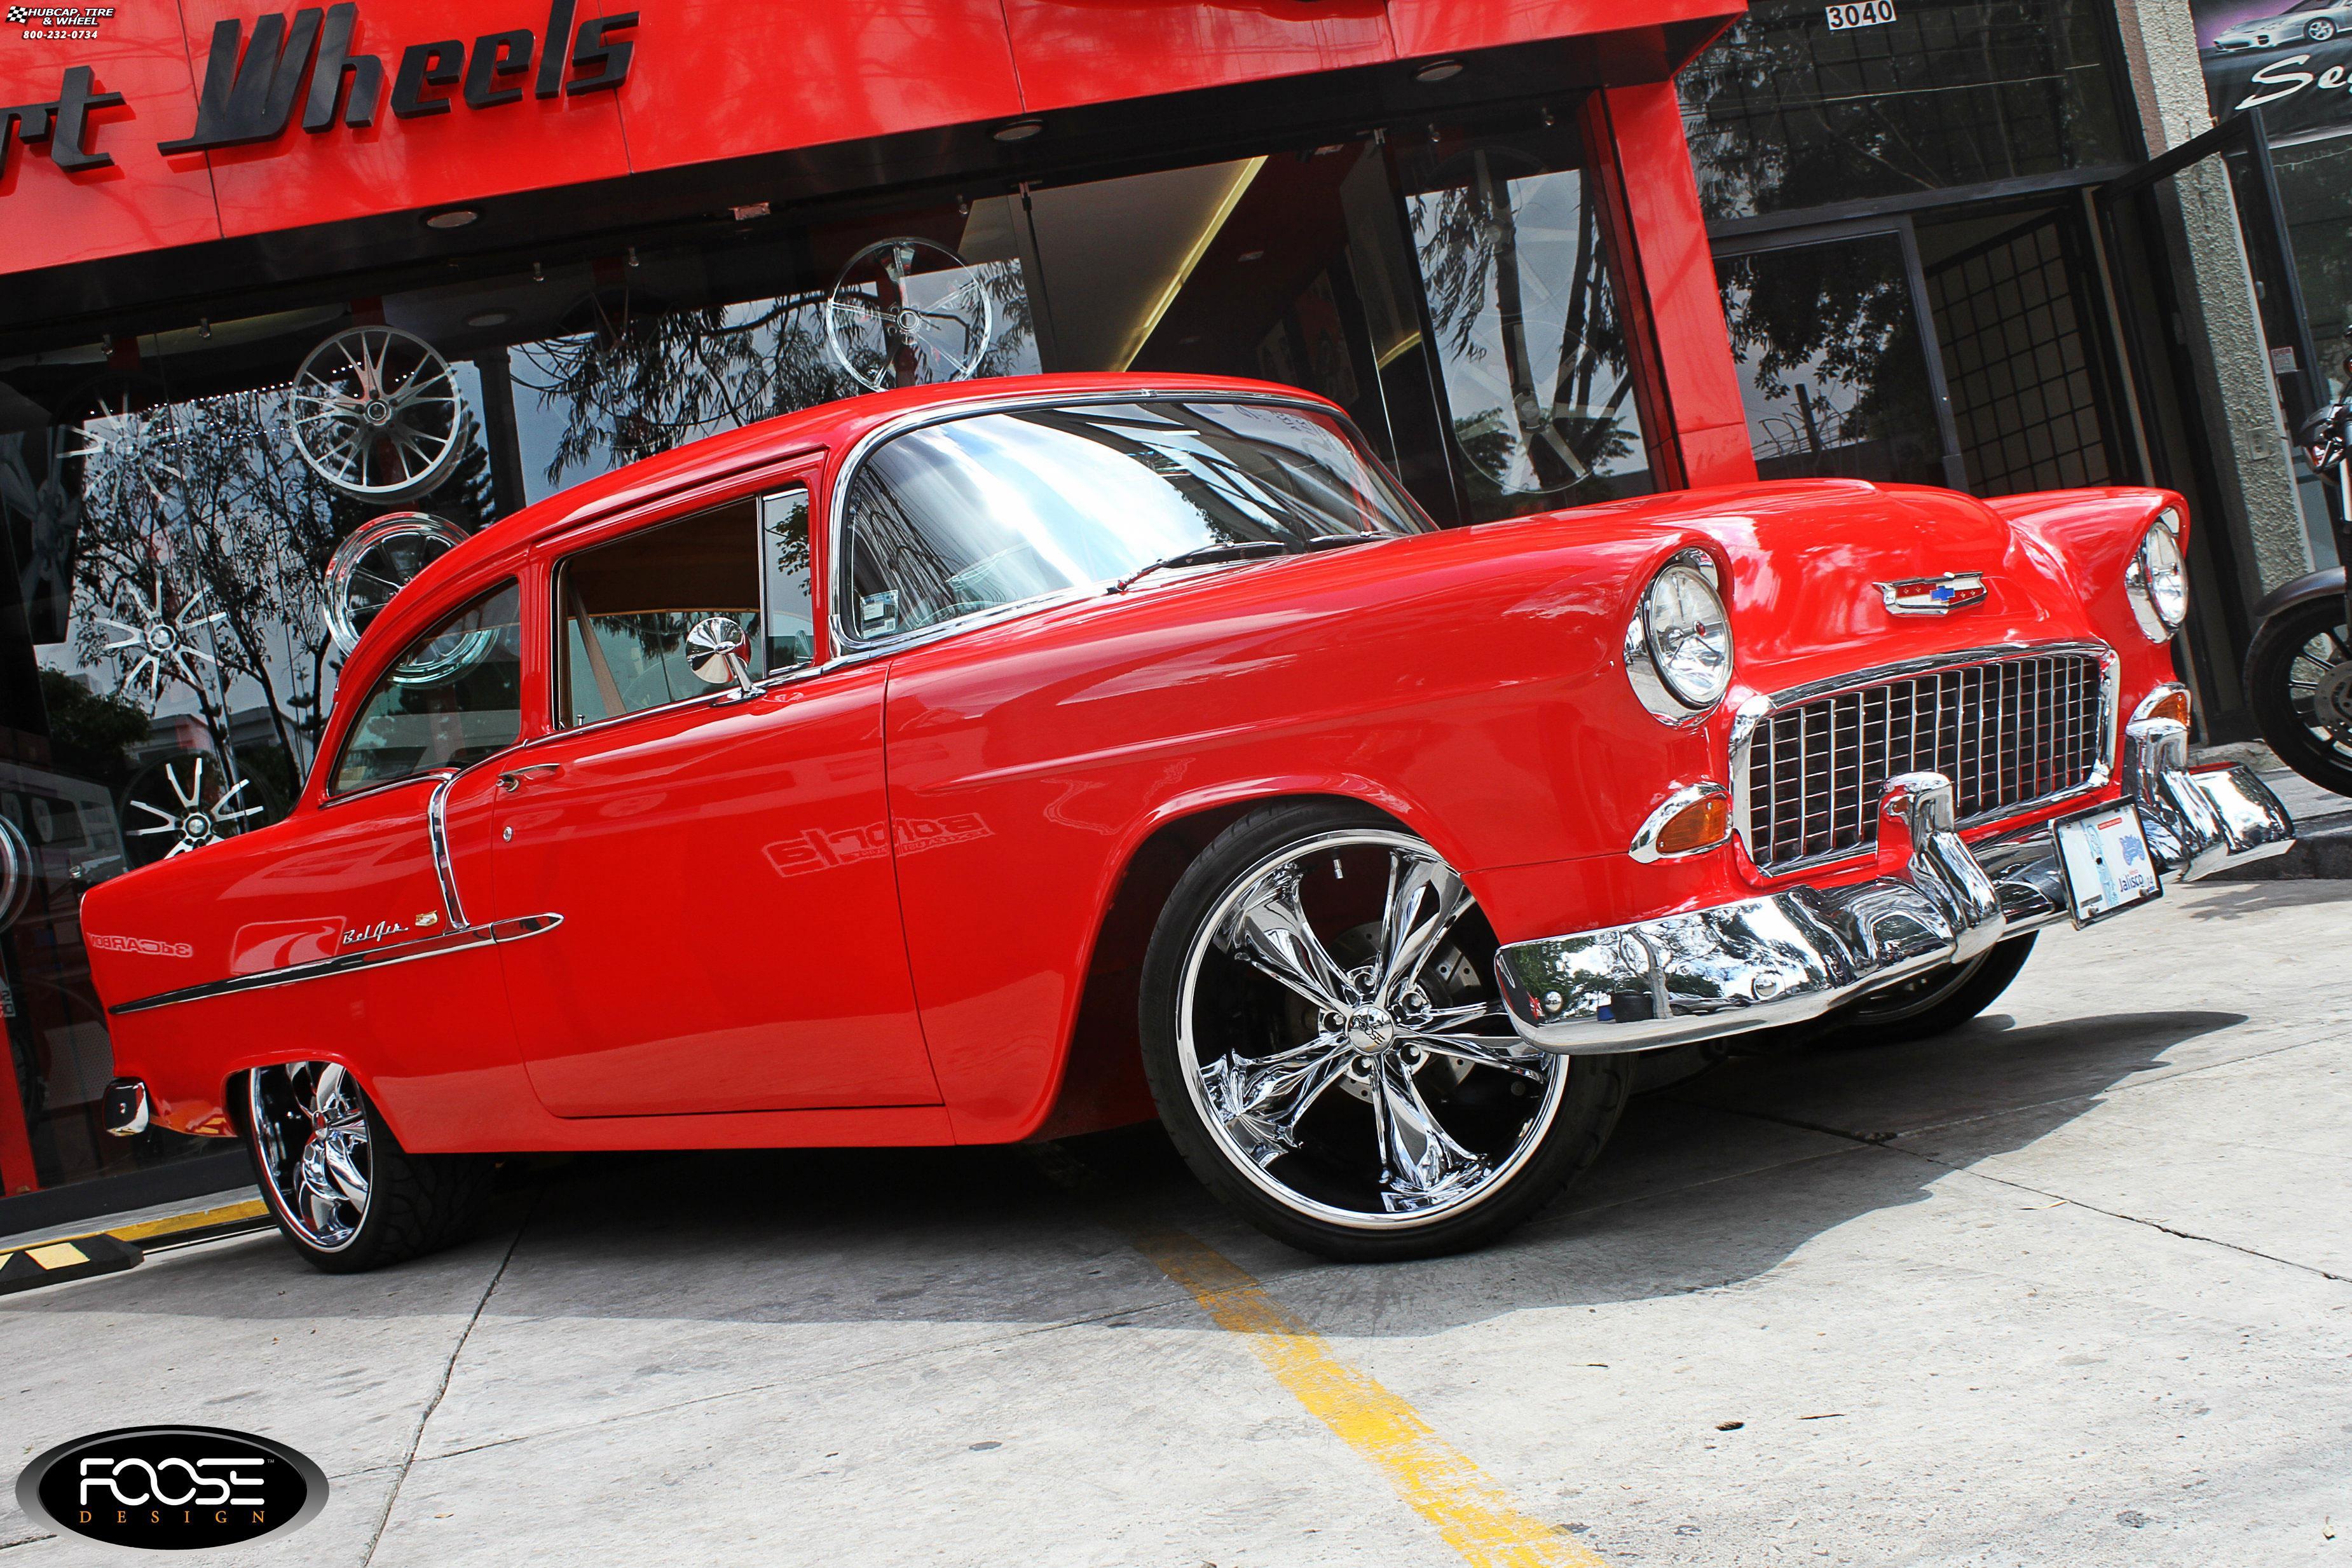 1955 Chevrolet Bel Air Foose Legend F105 Wheels Chrome